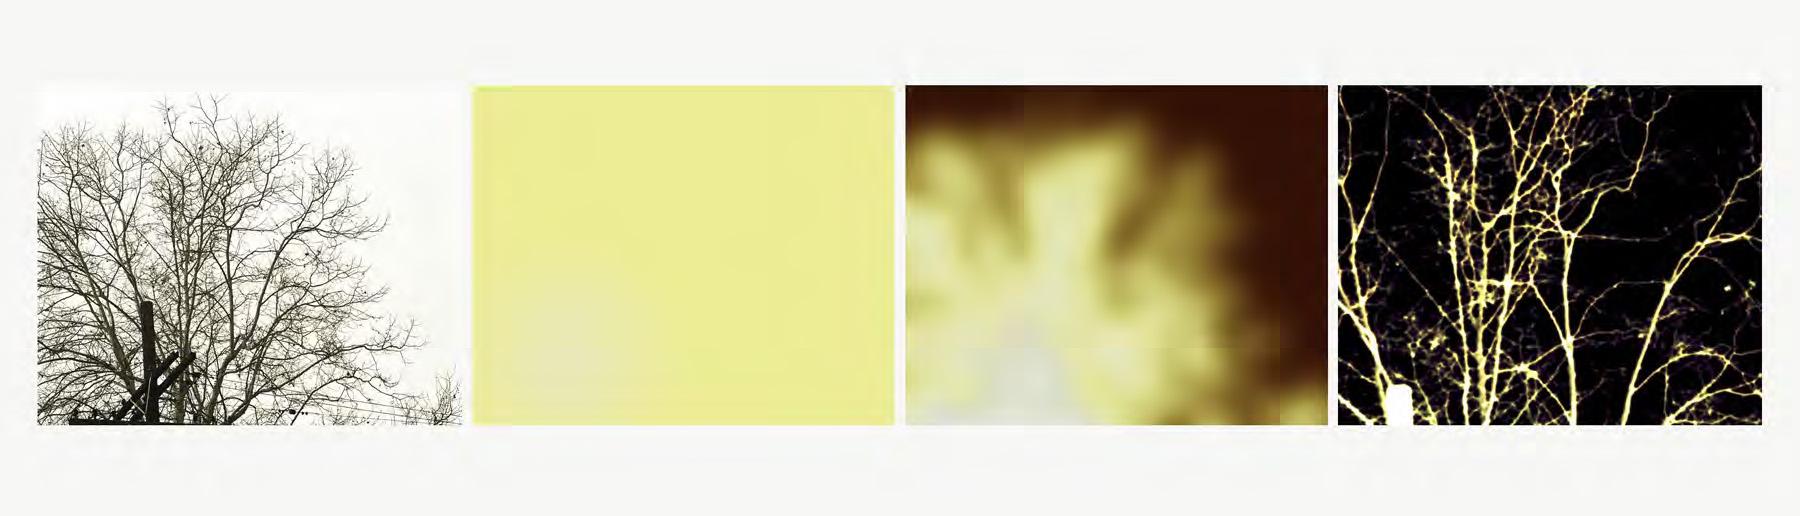 Uta Barth white blind (bright red) (02.12) 2002 fa...